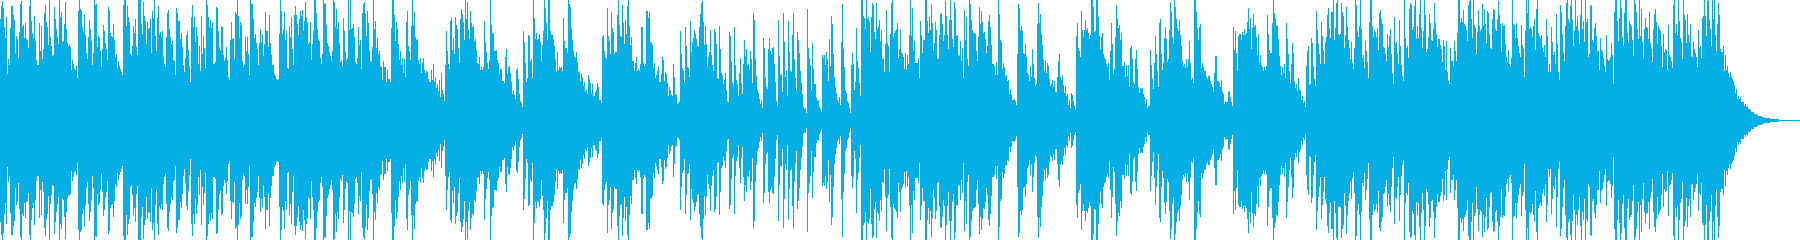 日本伝統音楽4(三味線+和太鼓)の再生済みの波形